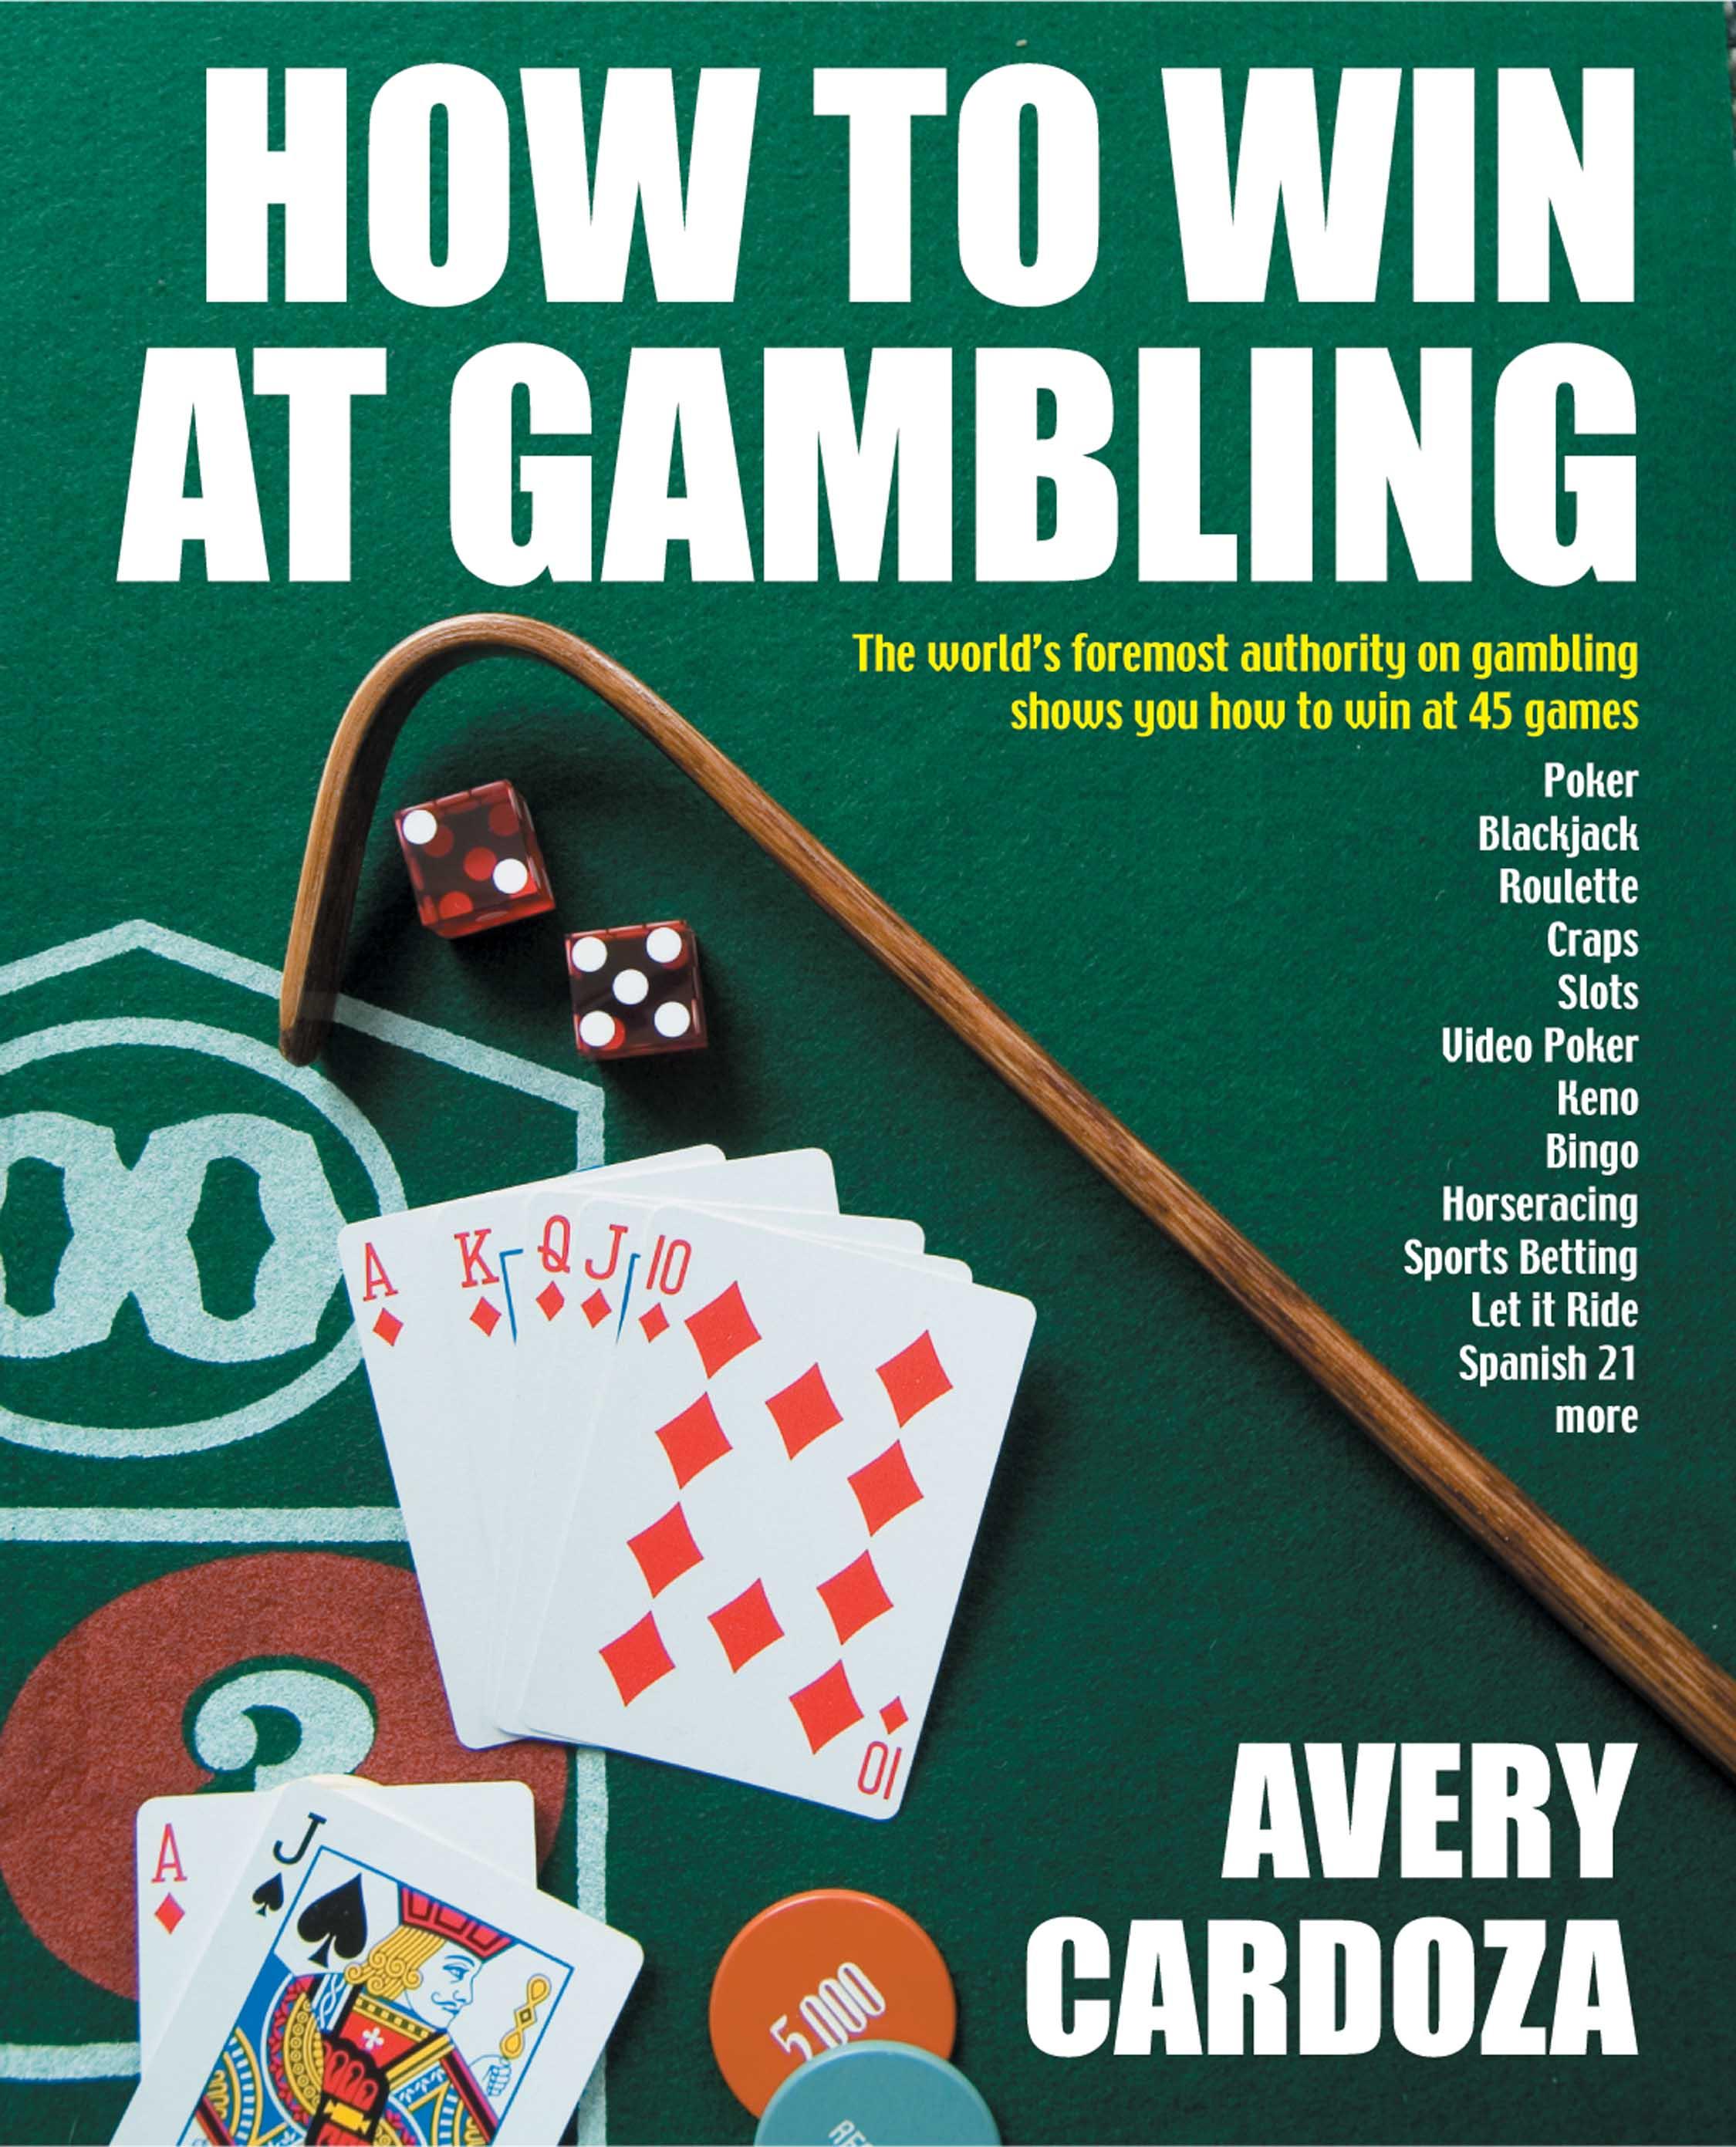 Books betting cysec binary options regulations section